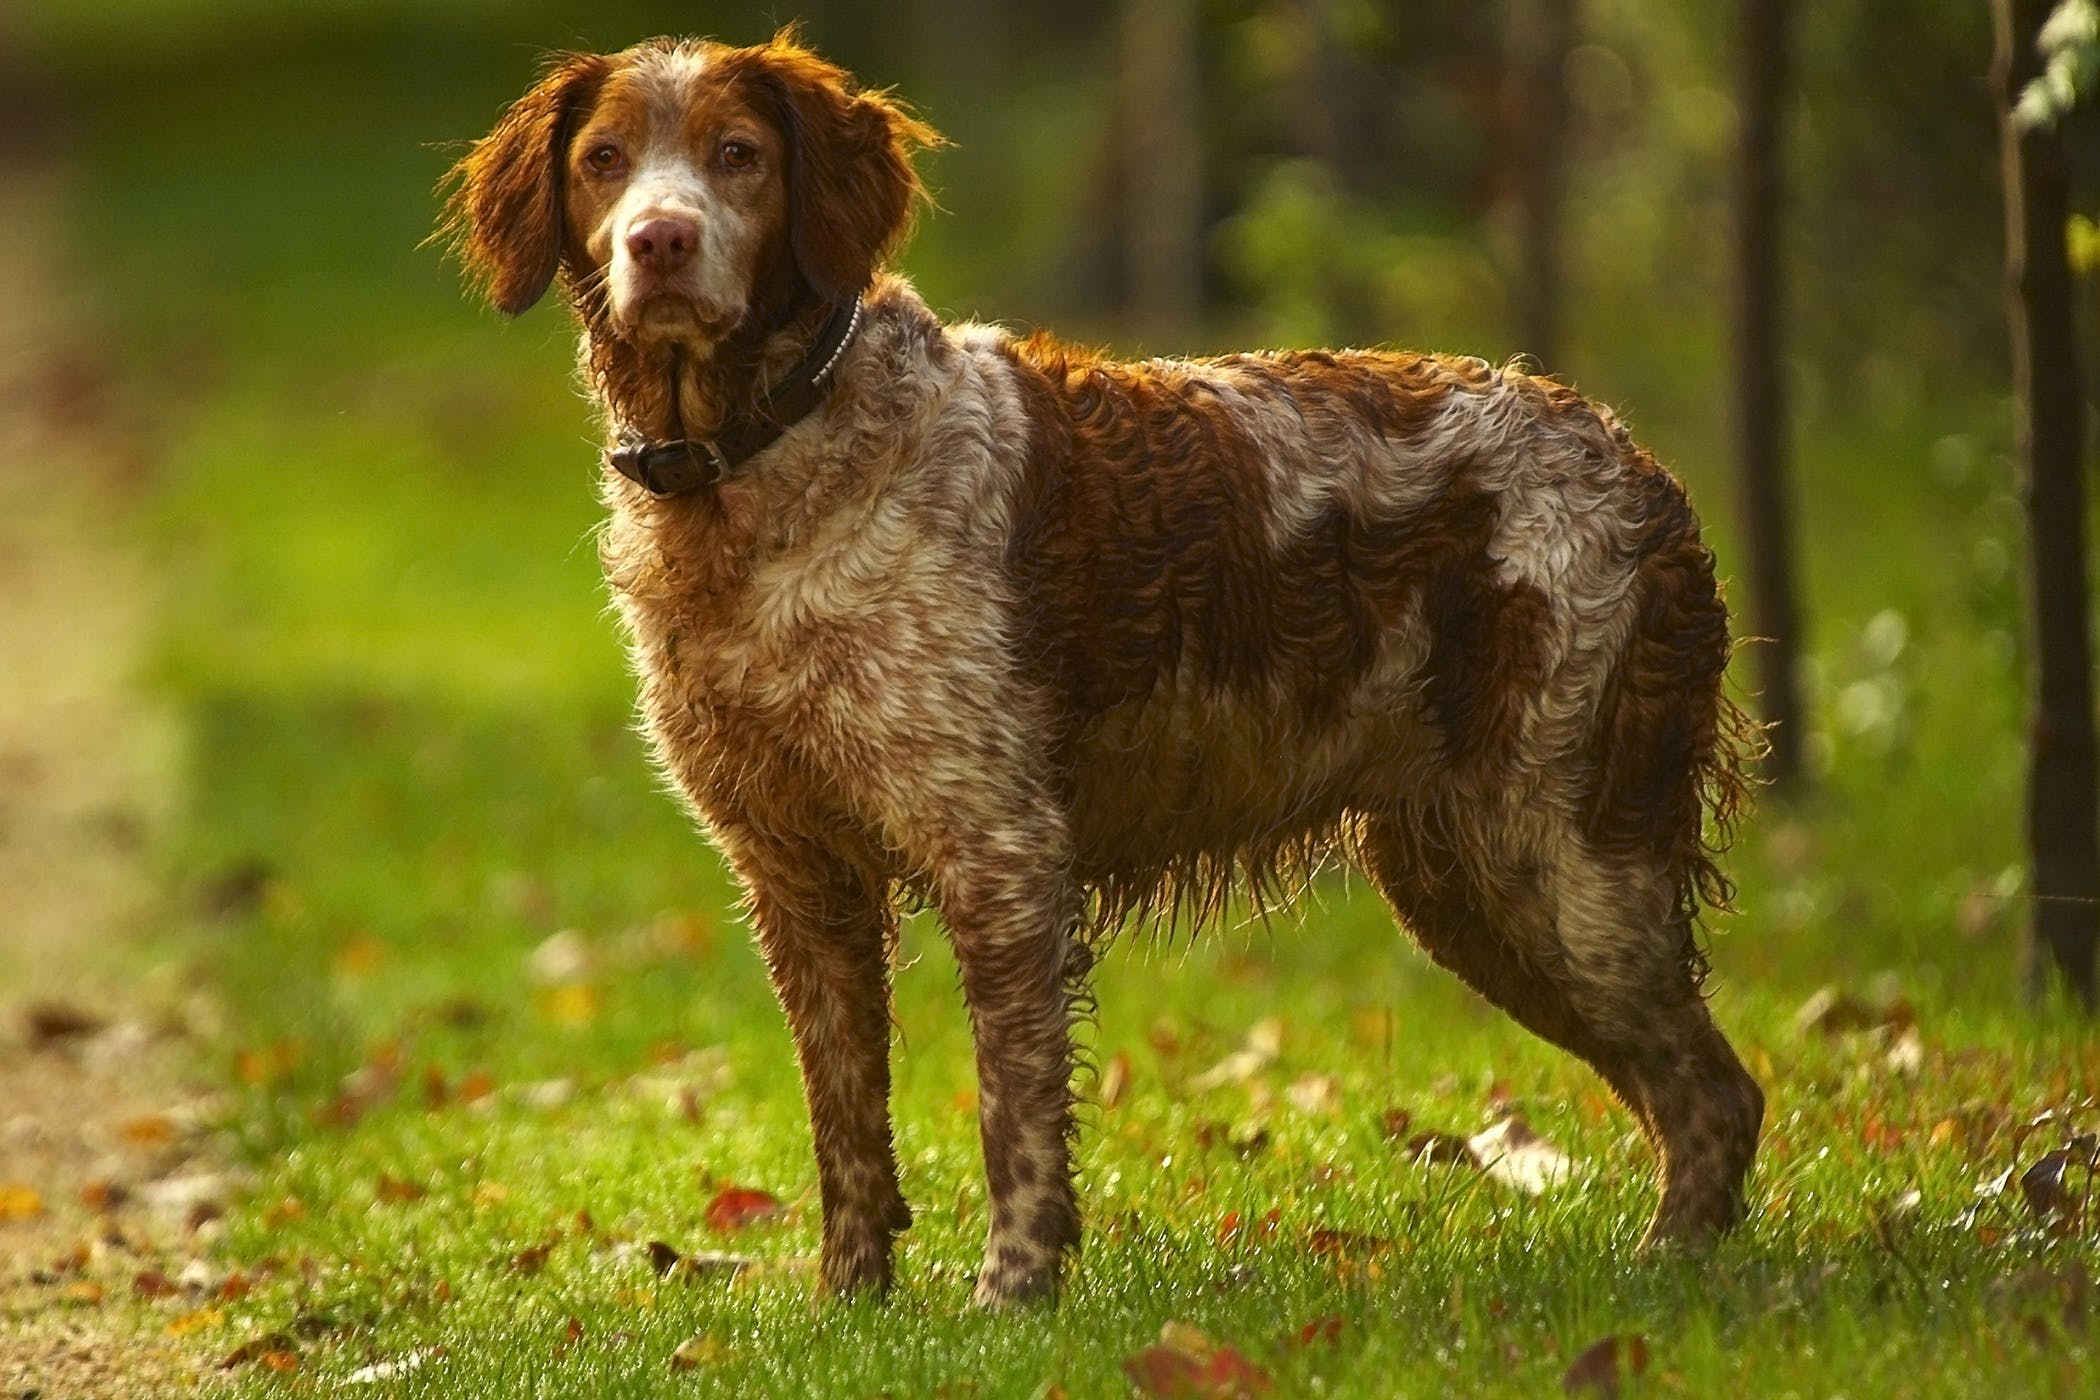 Mediastinal Pleural Debridement in Dogs